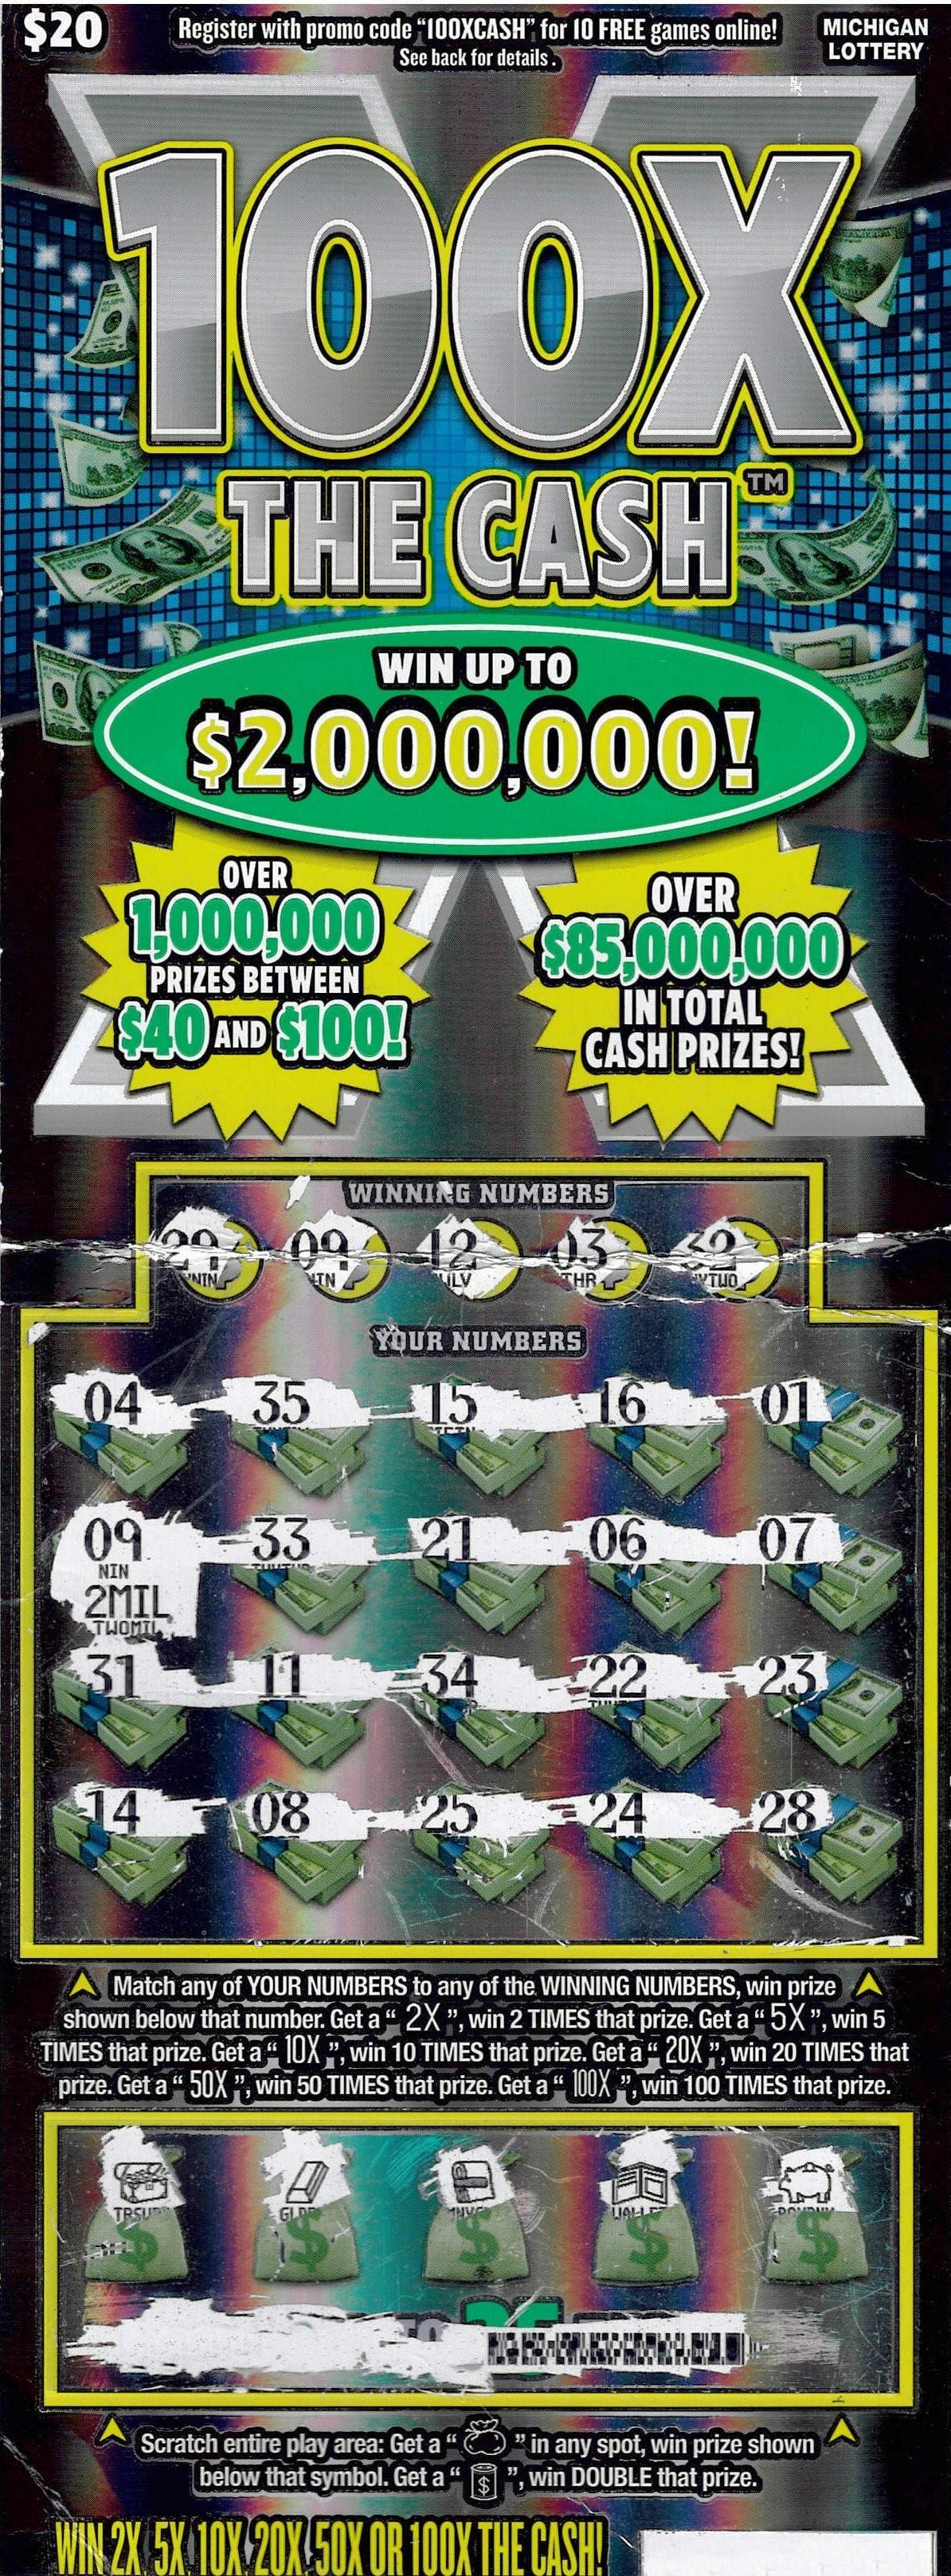 Michigan Man Wins $2 Million On Scratch-Off Lottery Ticket